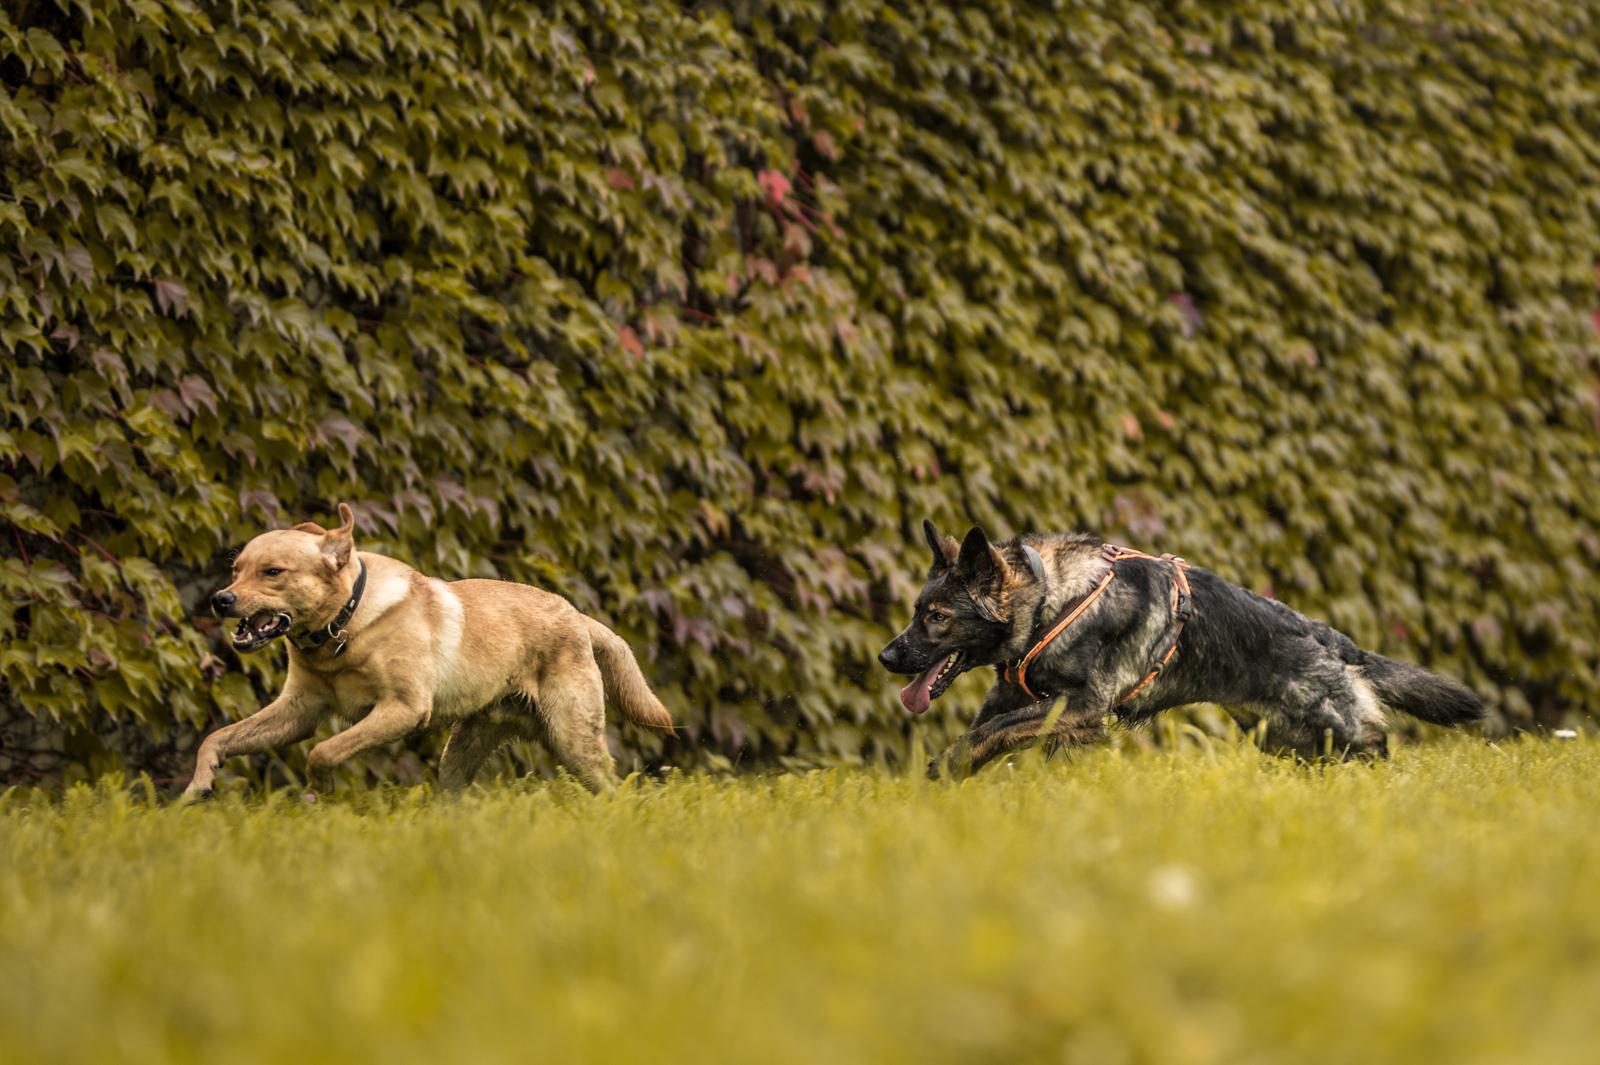 Tierfotograf-Labrador-Sven's Bildwerke-Hund-Hundefotografie9